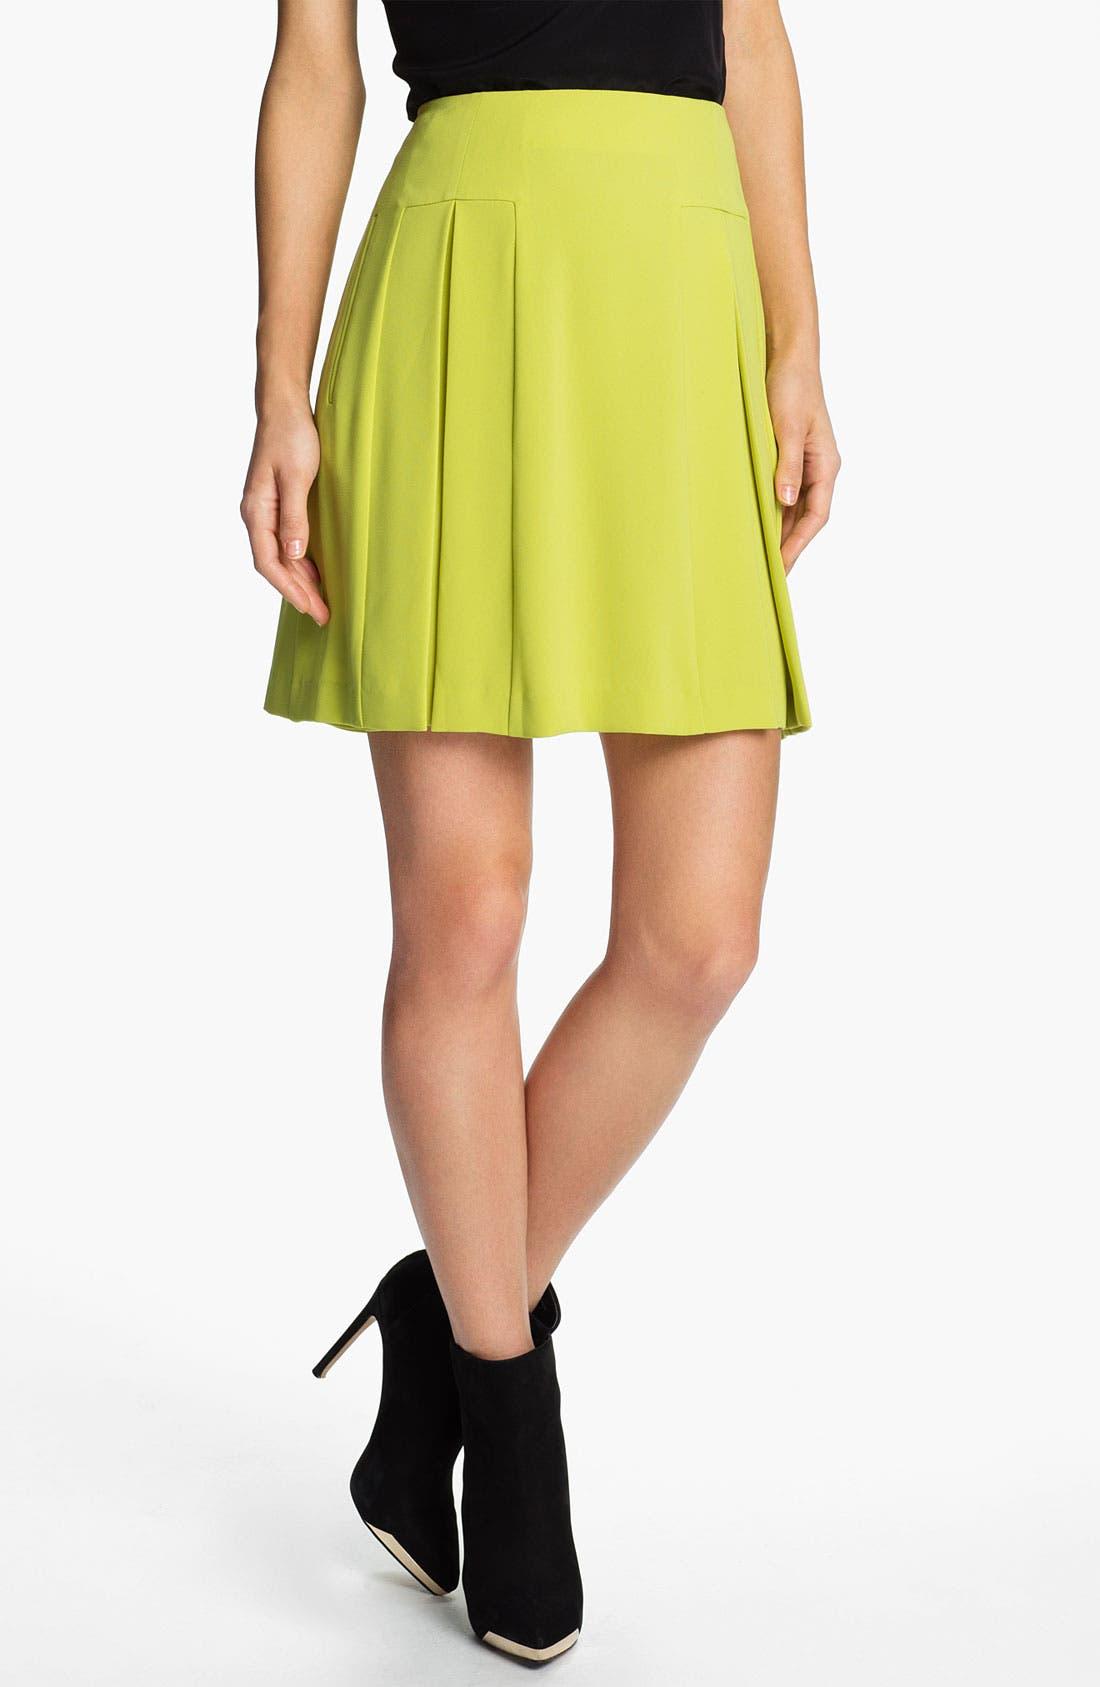 Alternate Image 1 Selected - Diane von Furstenberg 'Beata' Skirt